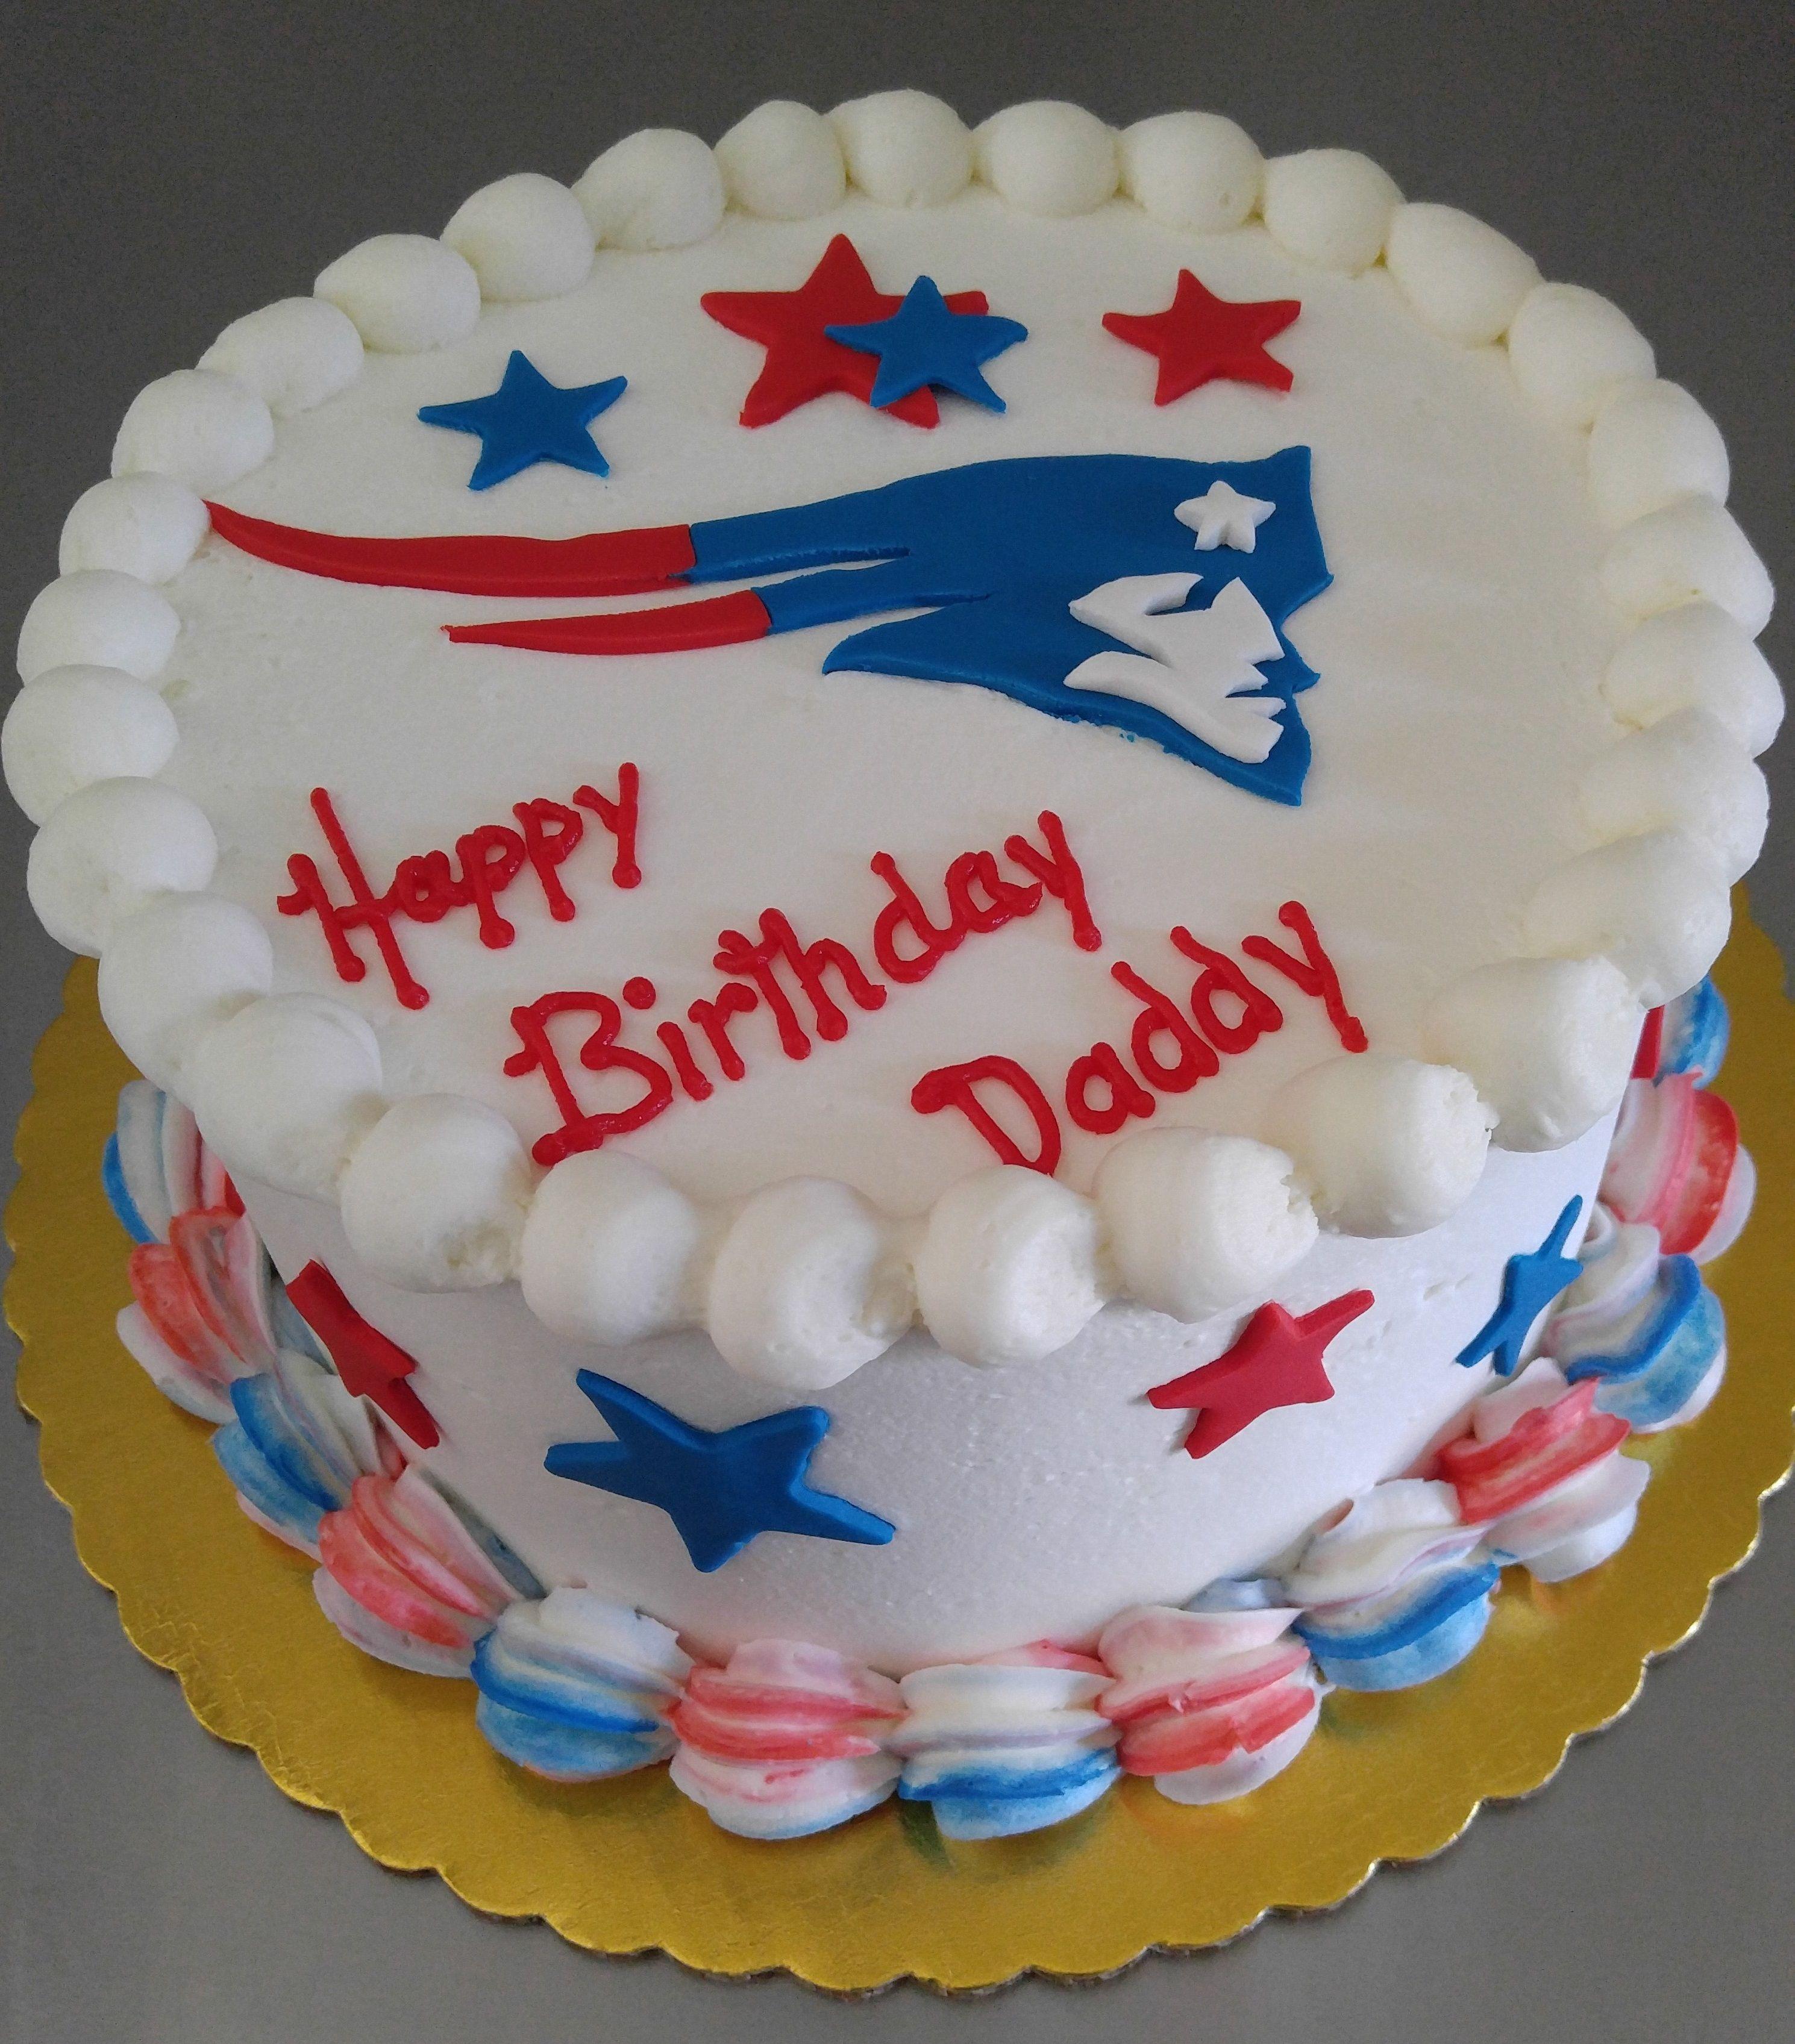 New England Patriots Birthday Cake, VintageBakery.com 803